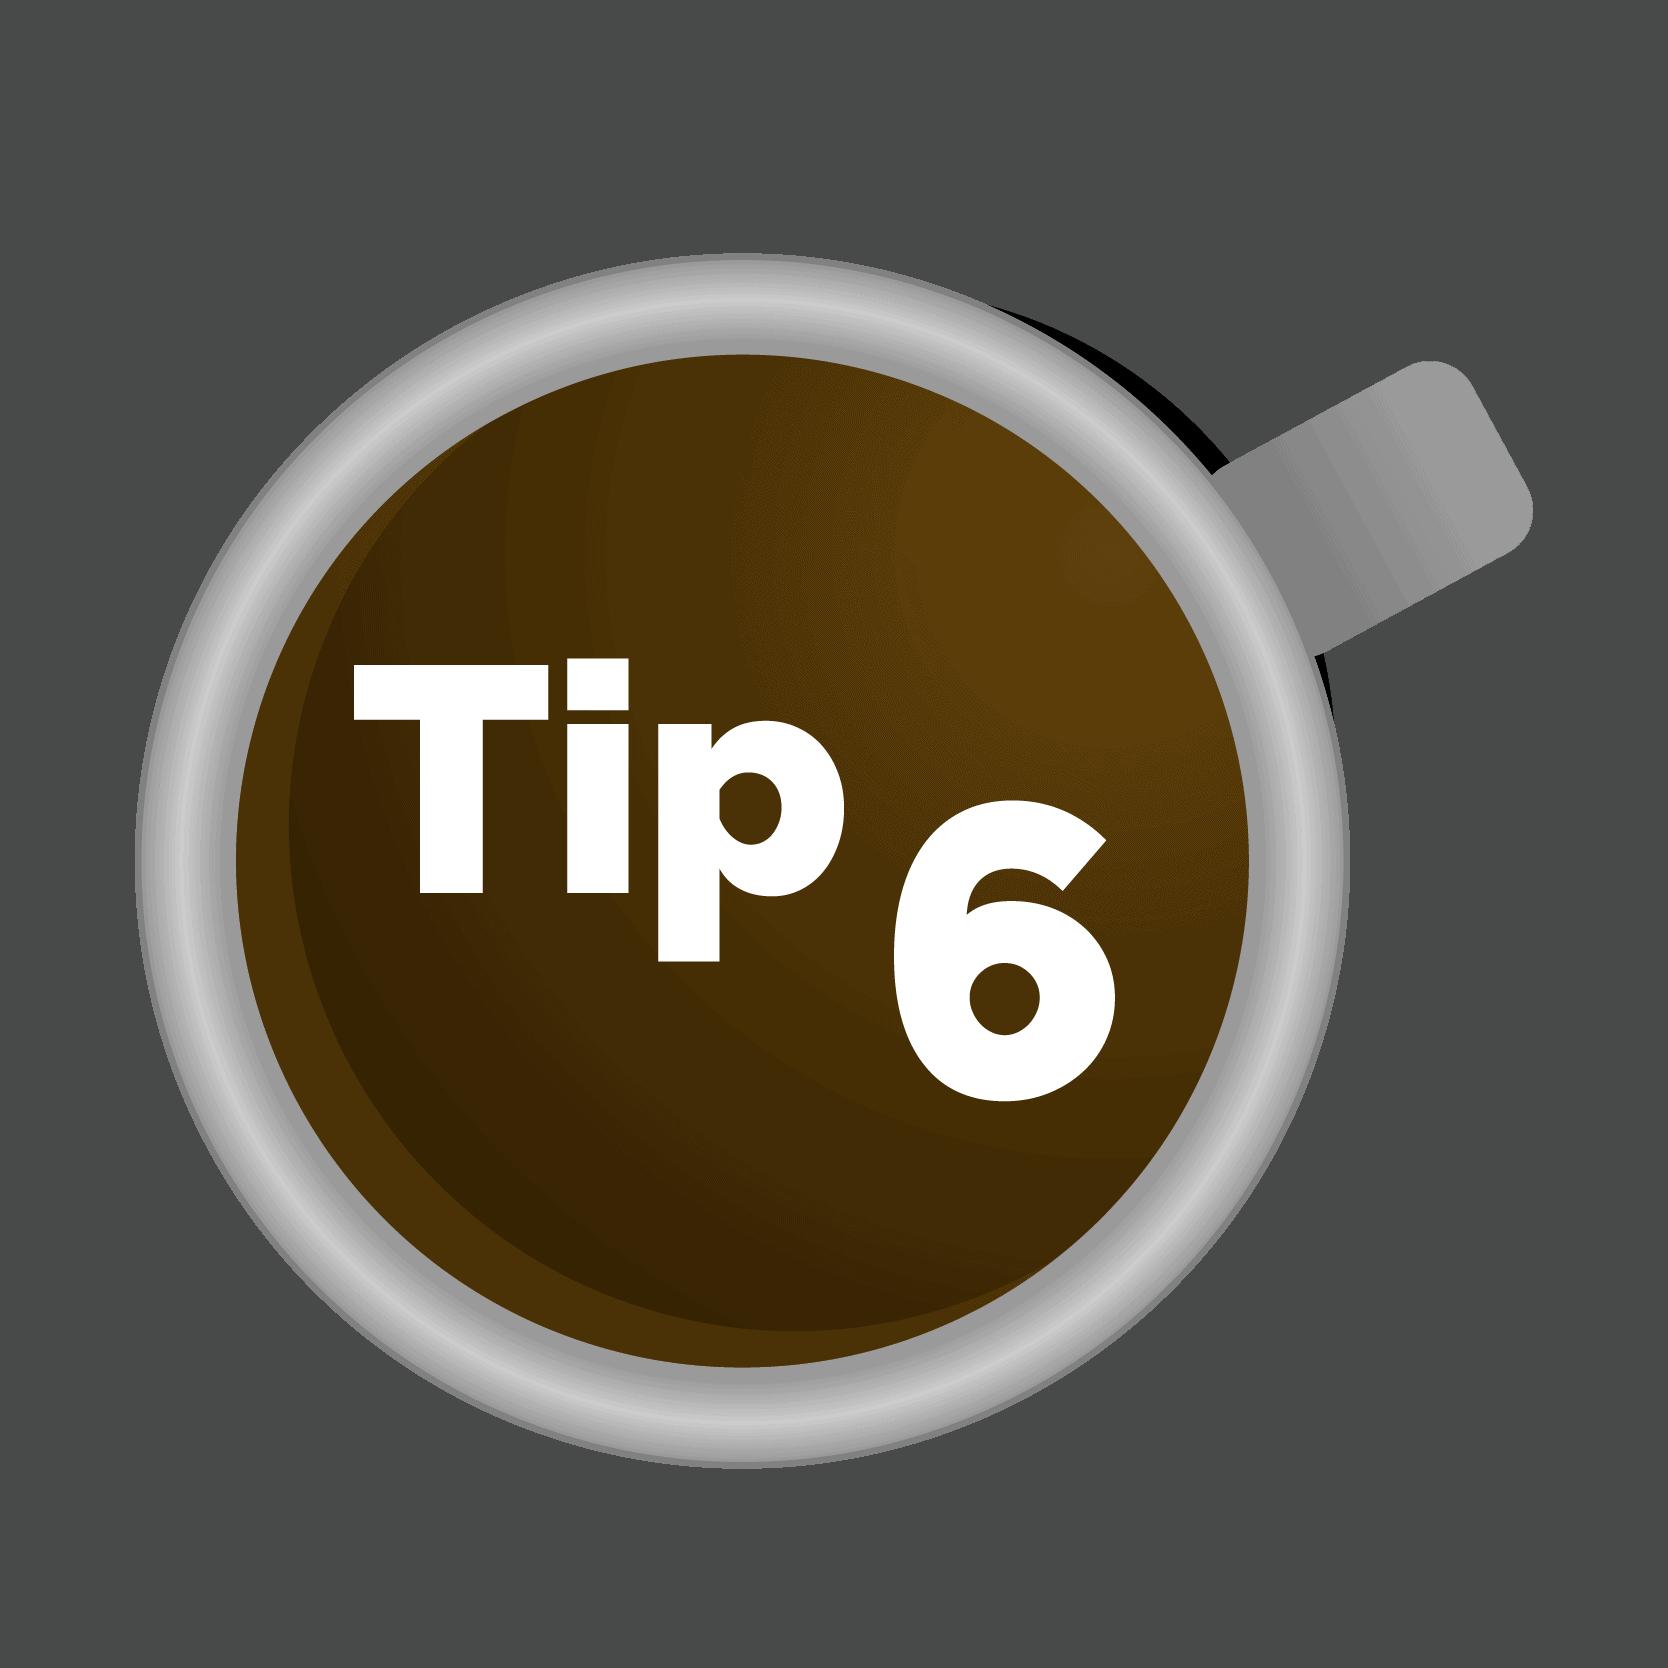 CoffeeCup-Tip6